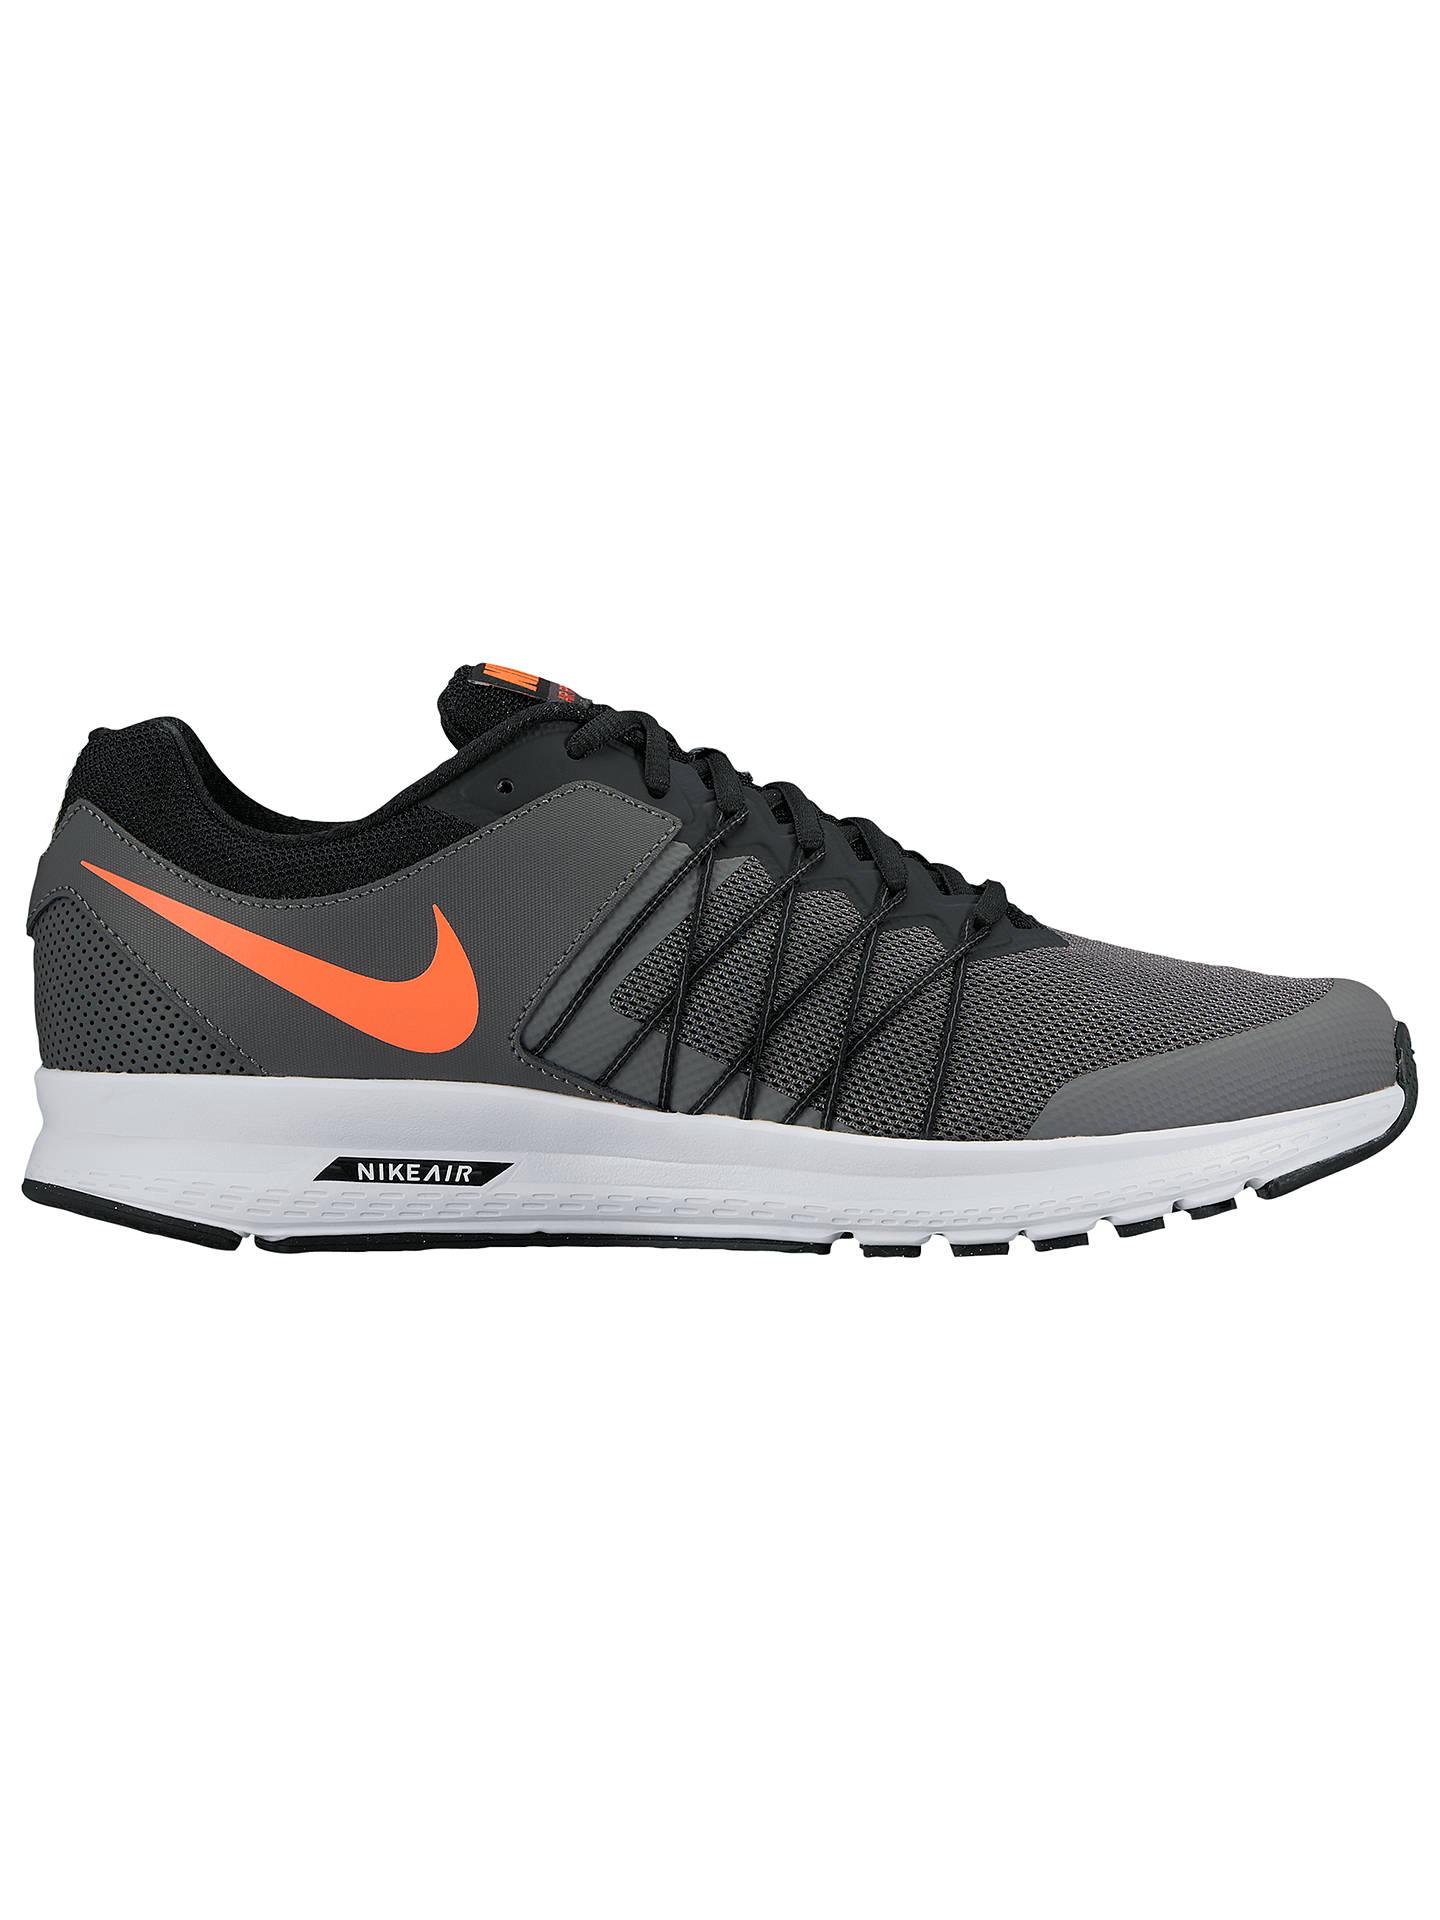 7cd1ffec0f7 Golf Shoes New Nike Mens Air Relentless 6 Running Shoe Black